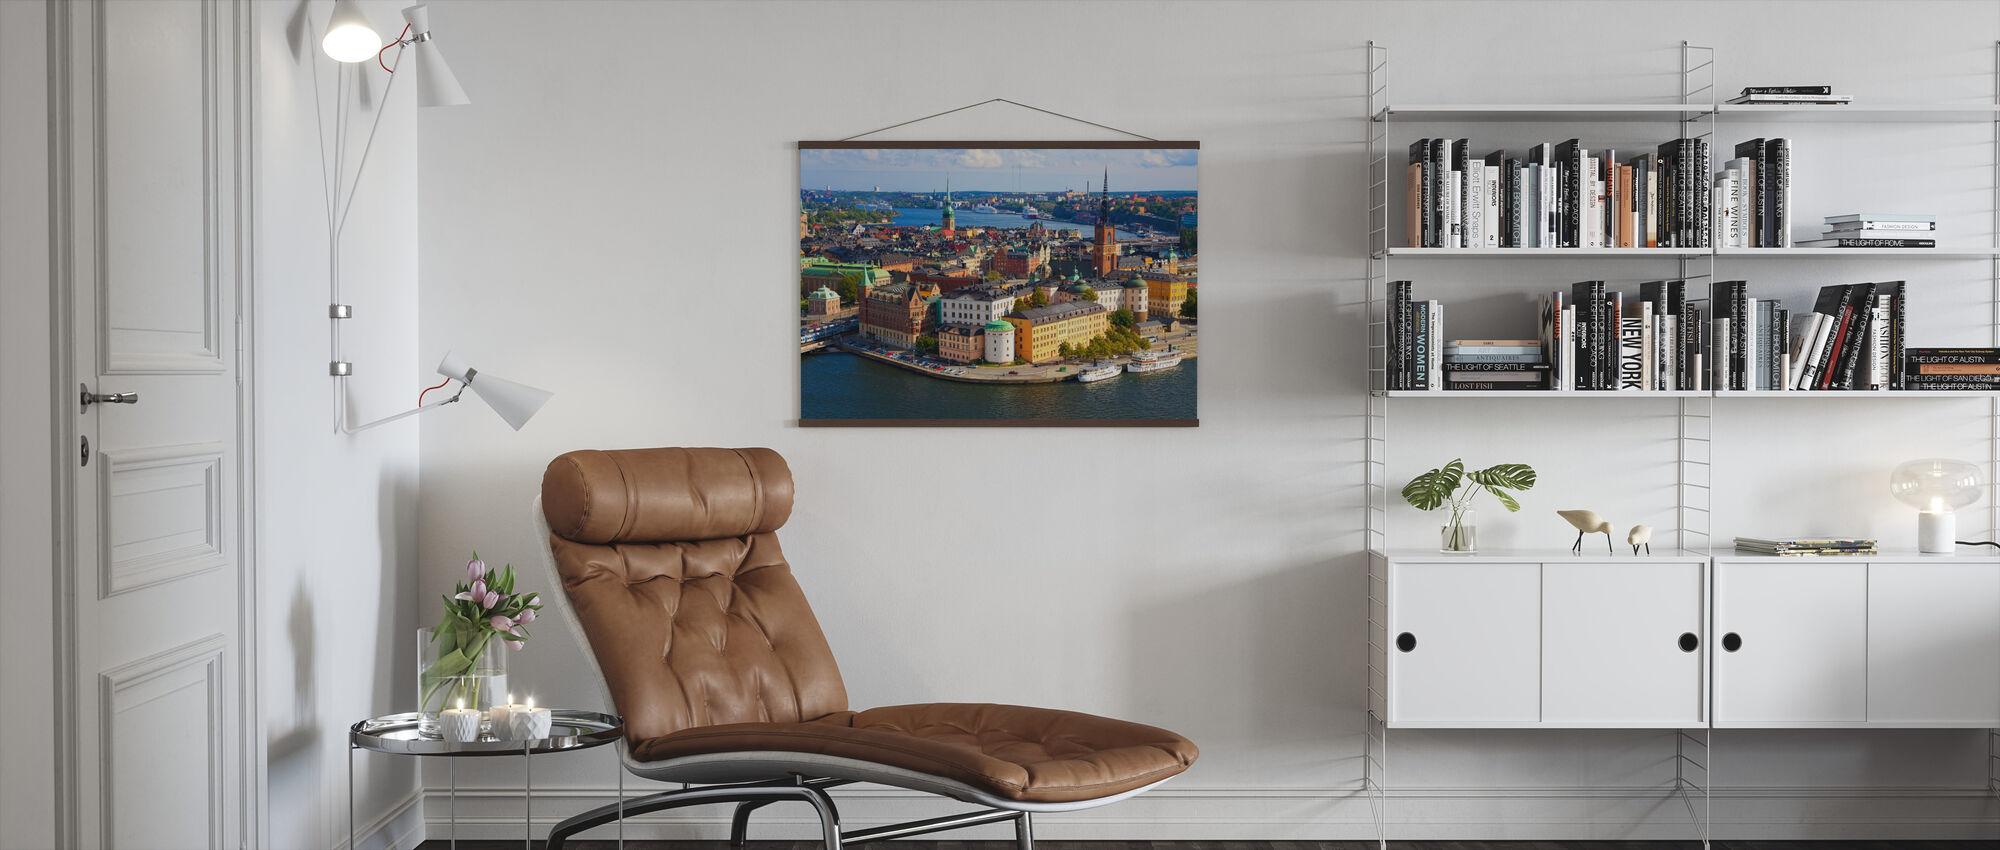 Stockholm in Sunlight - Poster - Living Room